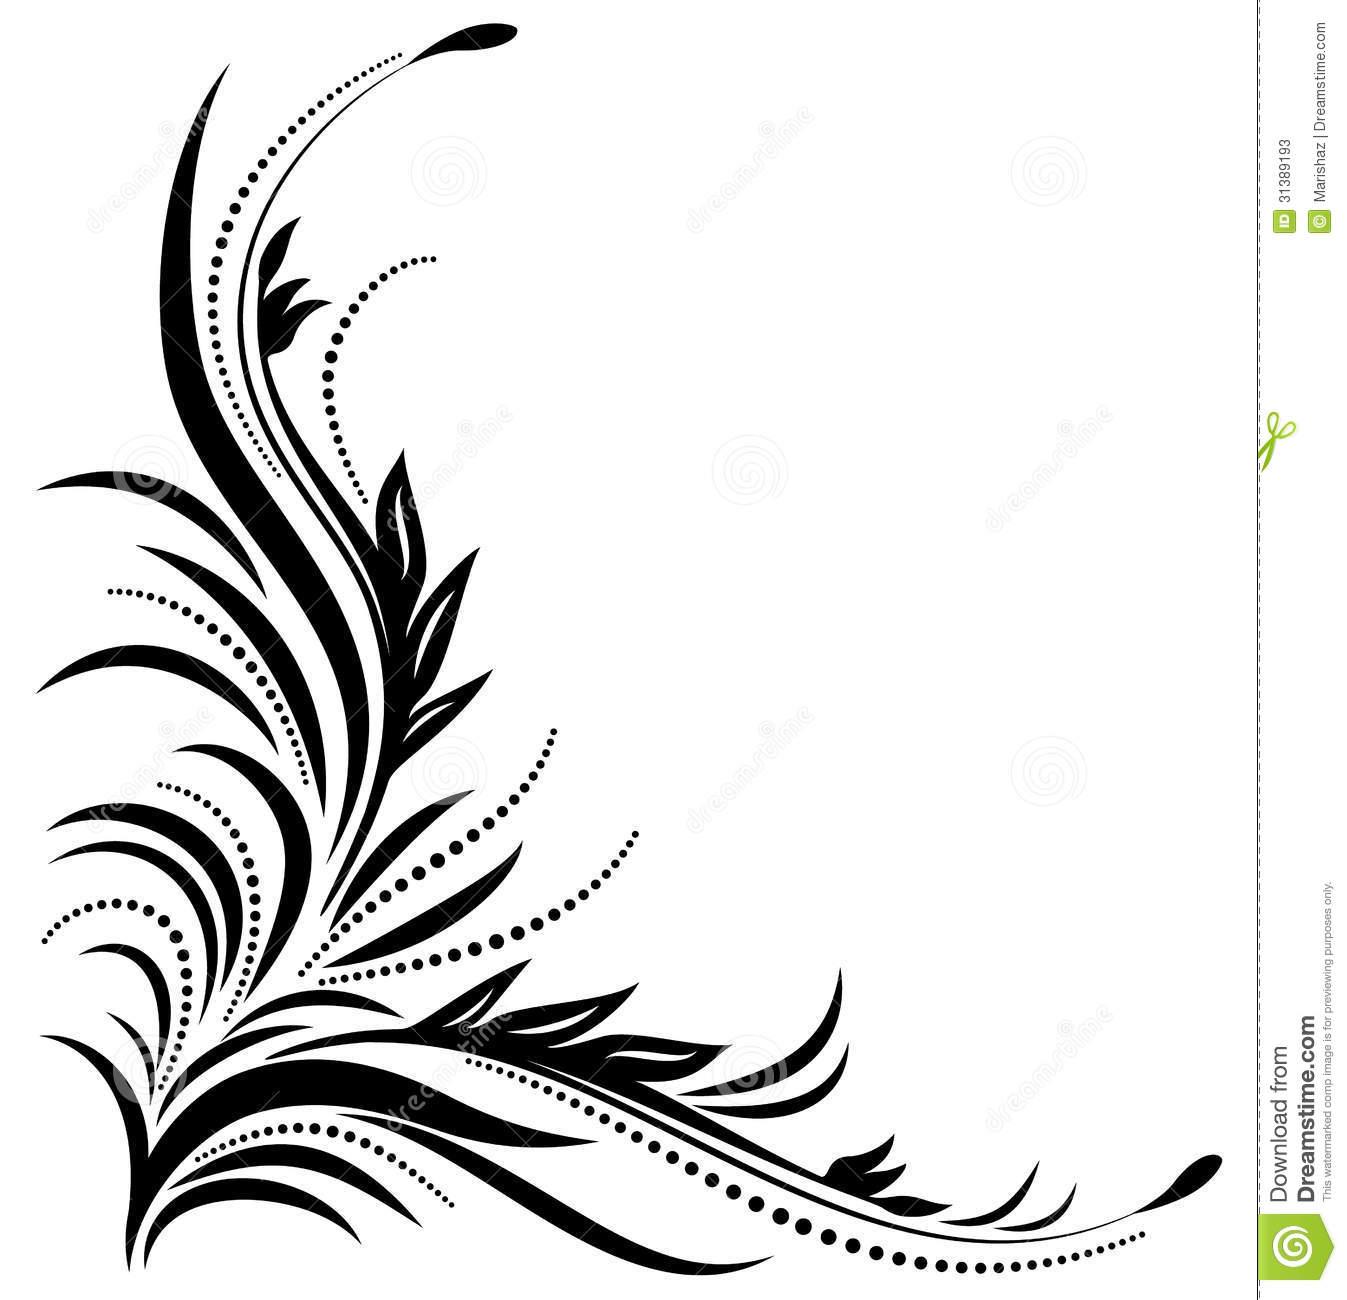 14 Fancy Swirl Corner Designs Images - Swirl Corner ...